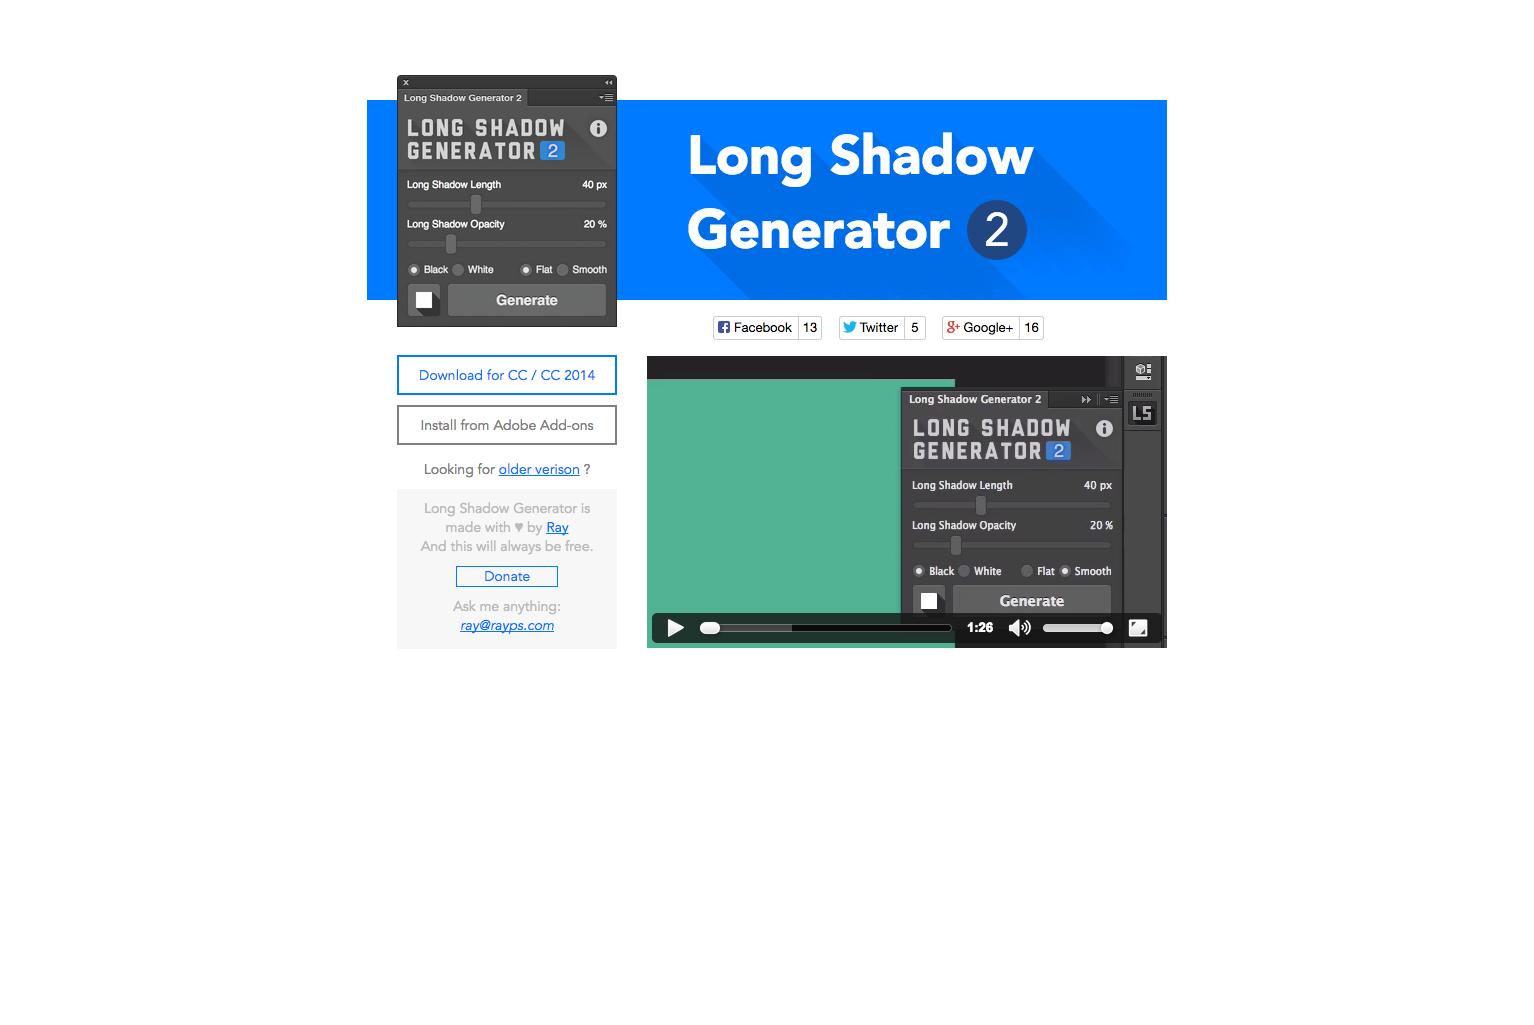 long-shadow-gen-2 | web-crunch.com